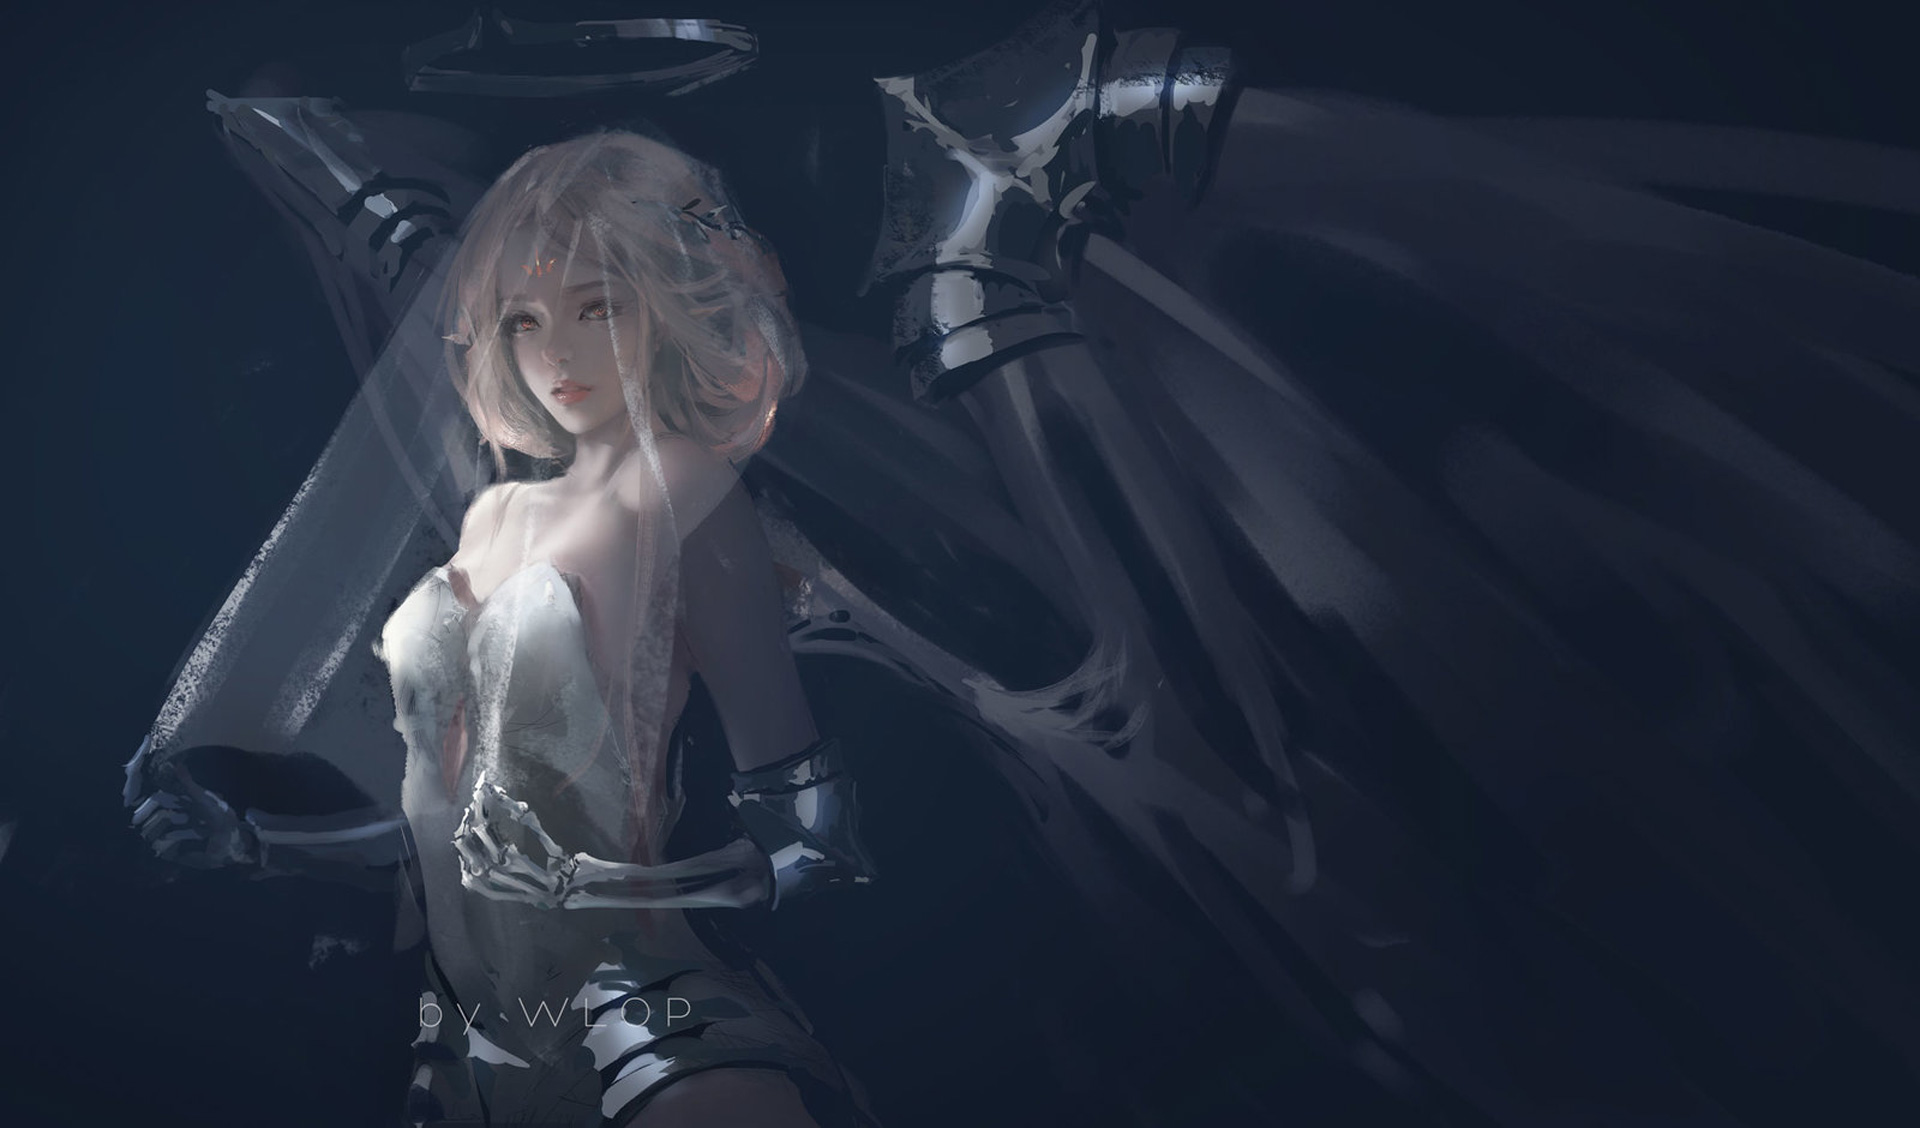 Bride Of Death By Wlop, HD Fantasy Girls, 4k Wallpapers